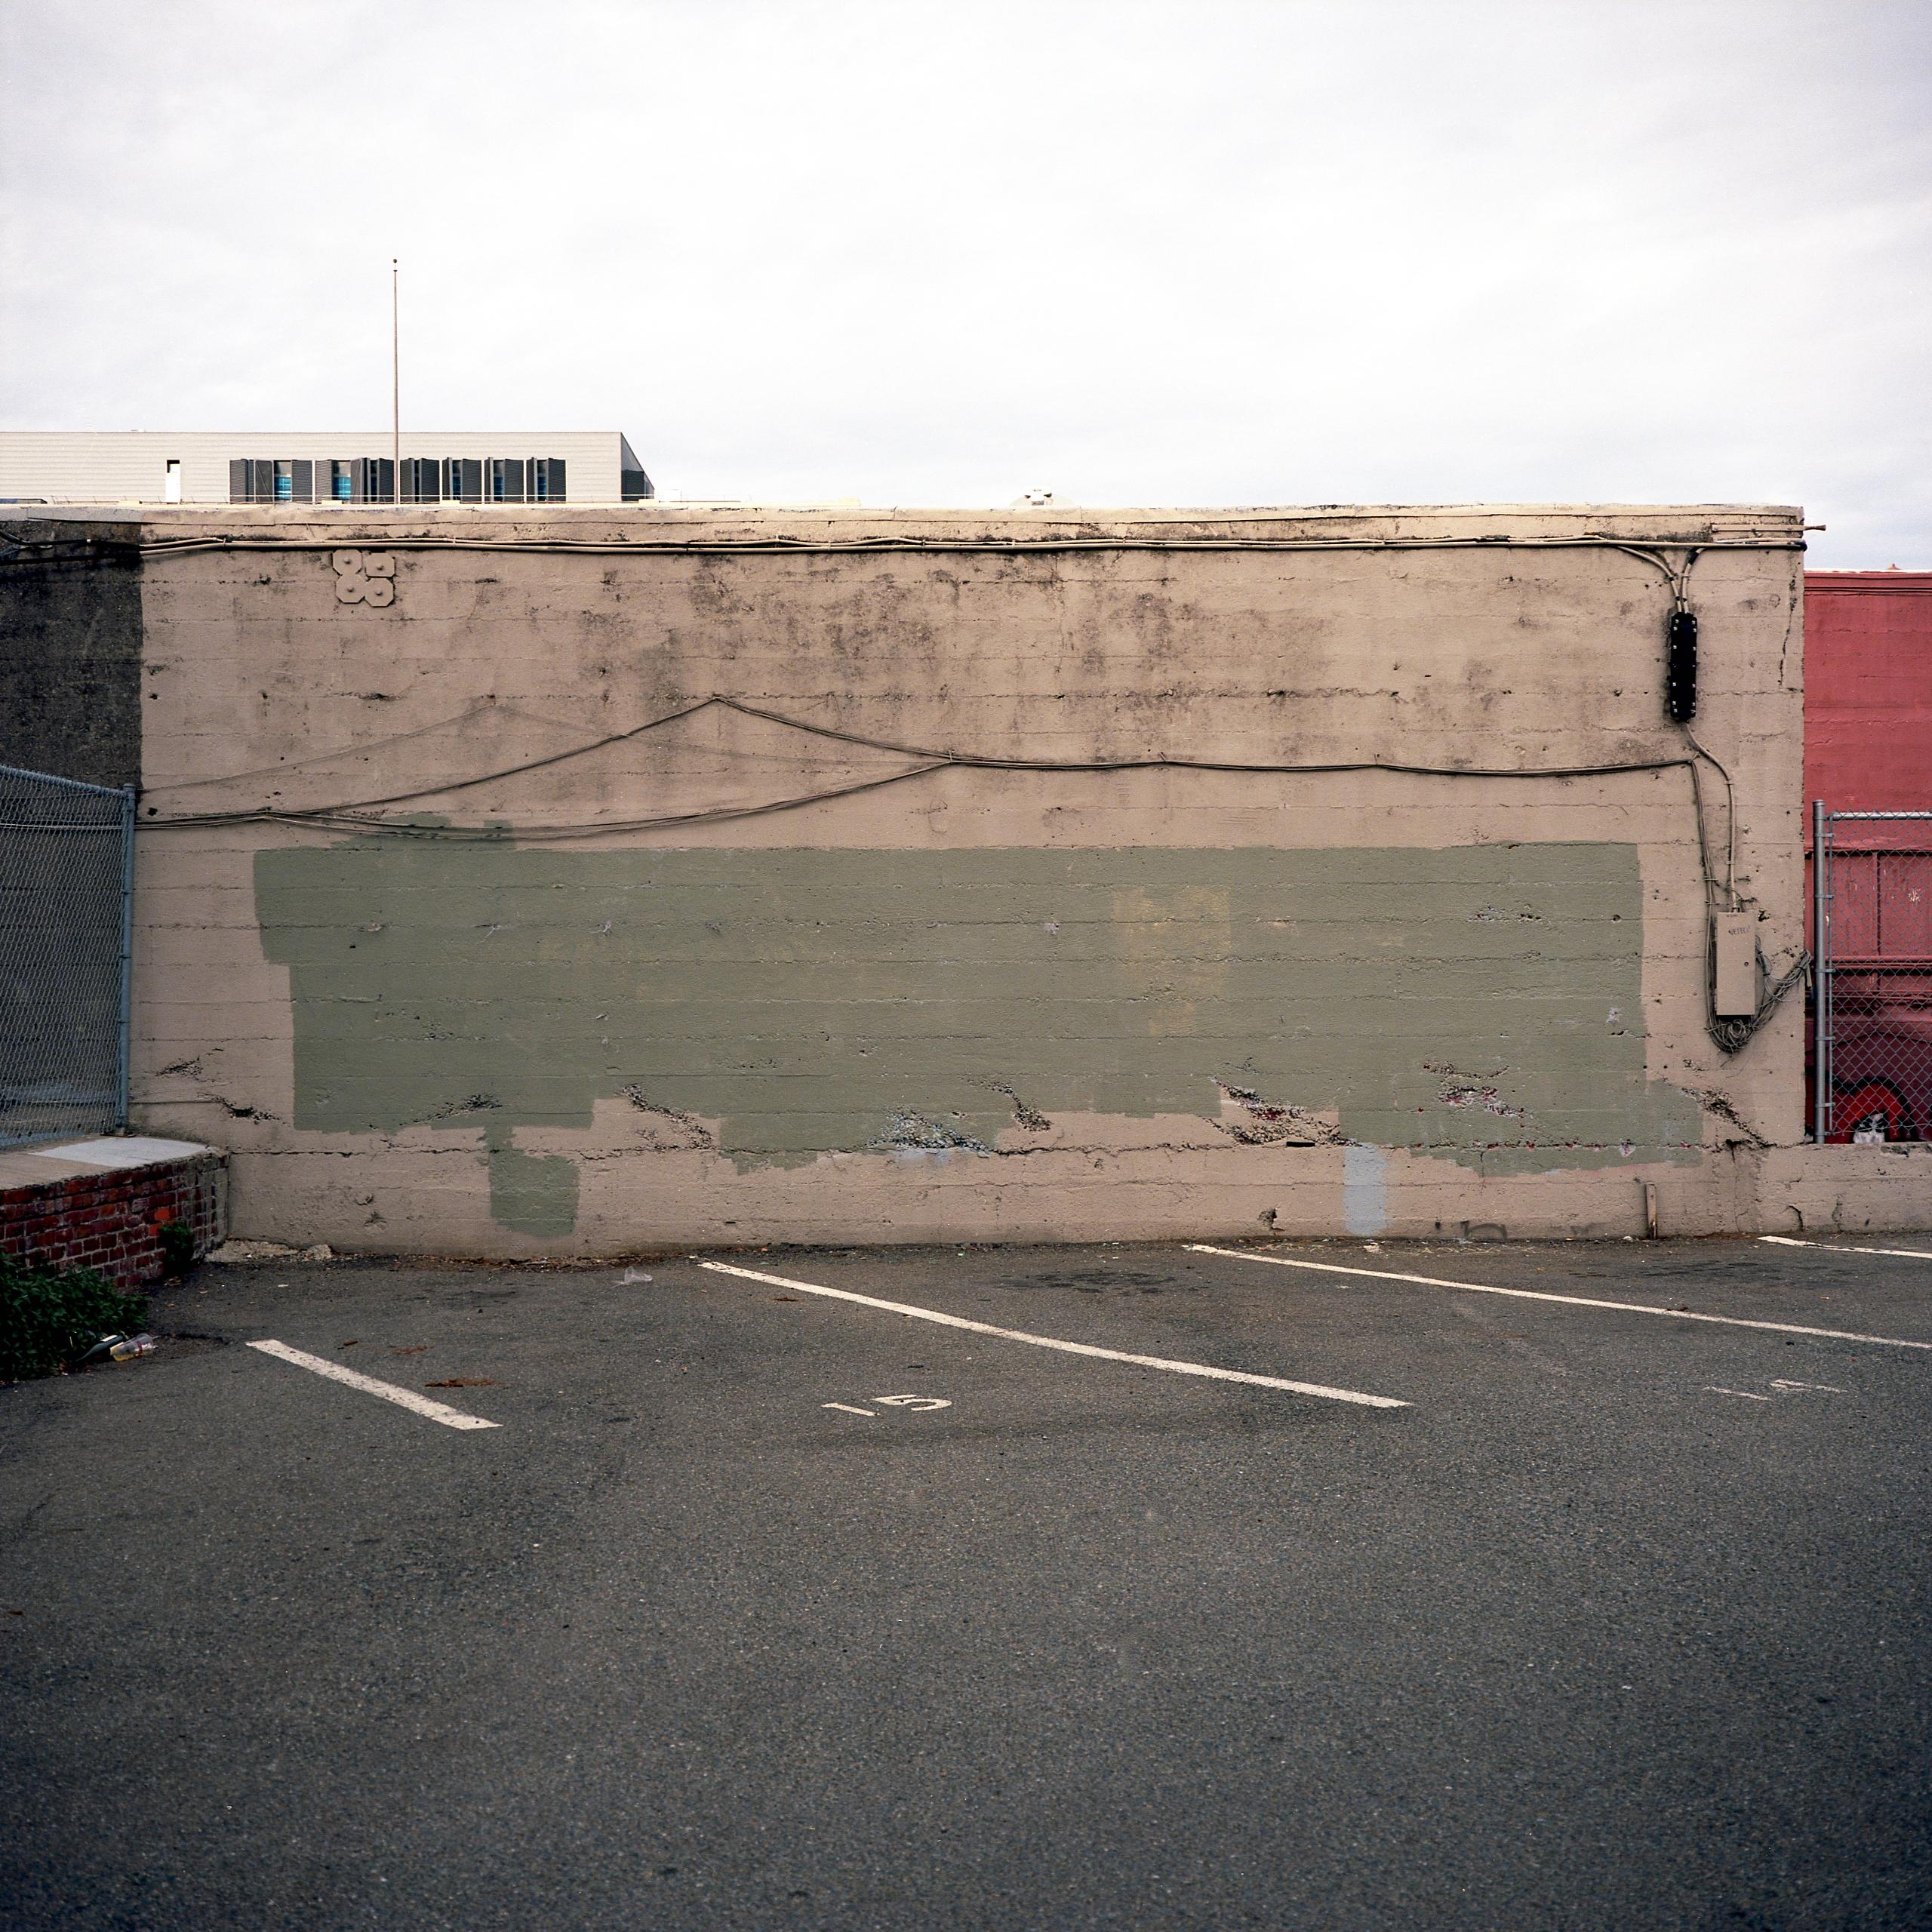 Kodak Ektar 100 Mamiya 6 Berkel - biosfear | ello